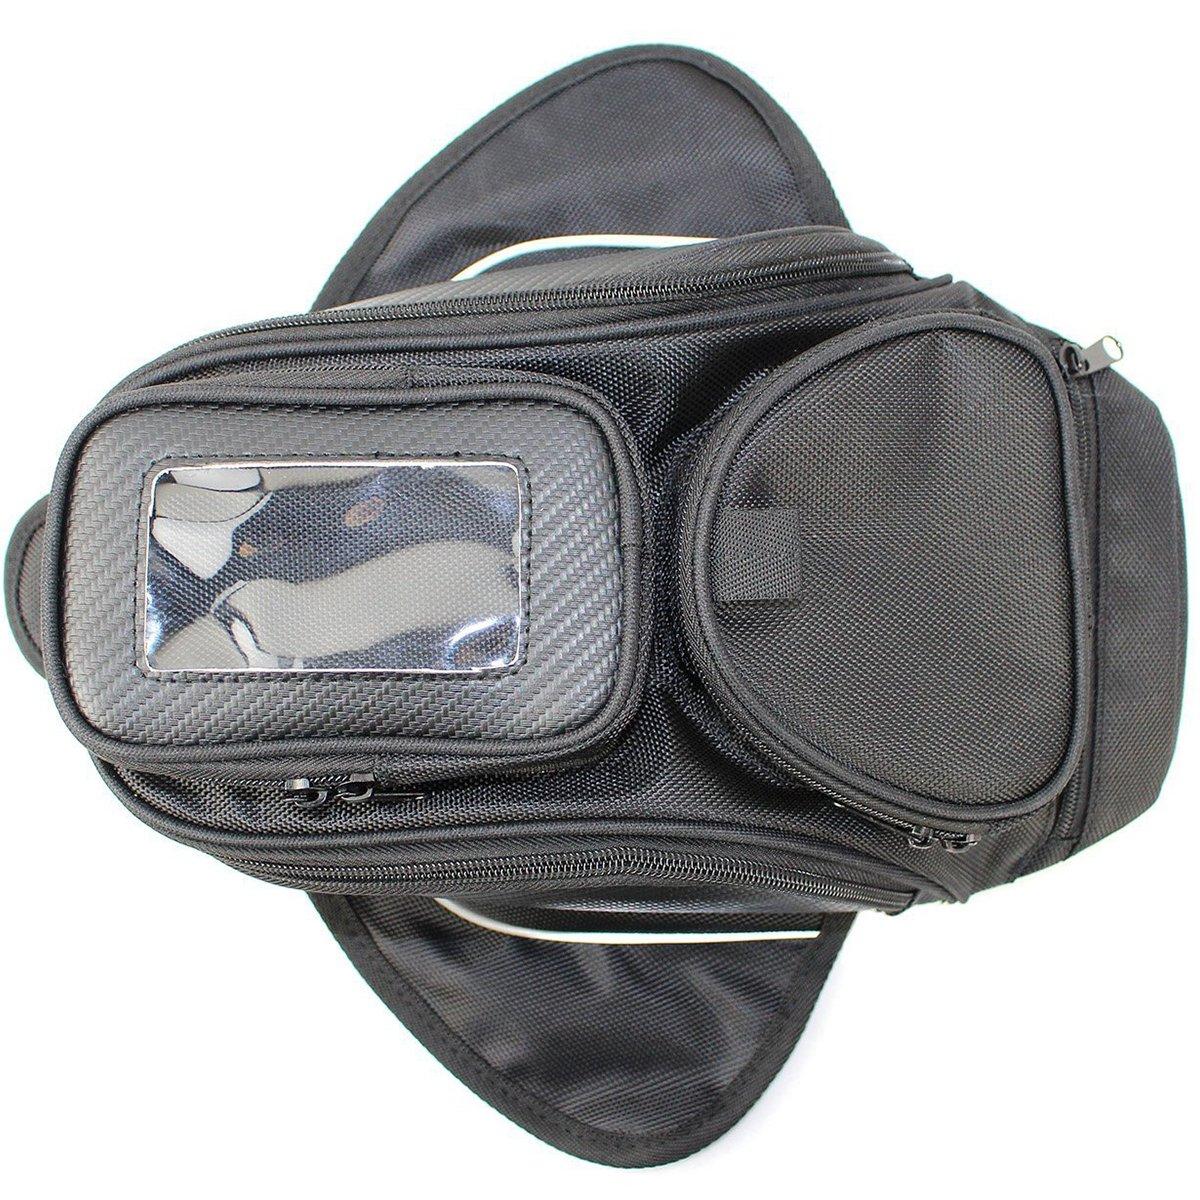 Universal Motorcycle Tank Bag Waterproof, Motorbike Oil Fuel Tank Bag Magnetic Motorbike Riding Bag Case by Amhousejoy (Black) HONGYI TRADE